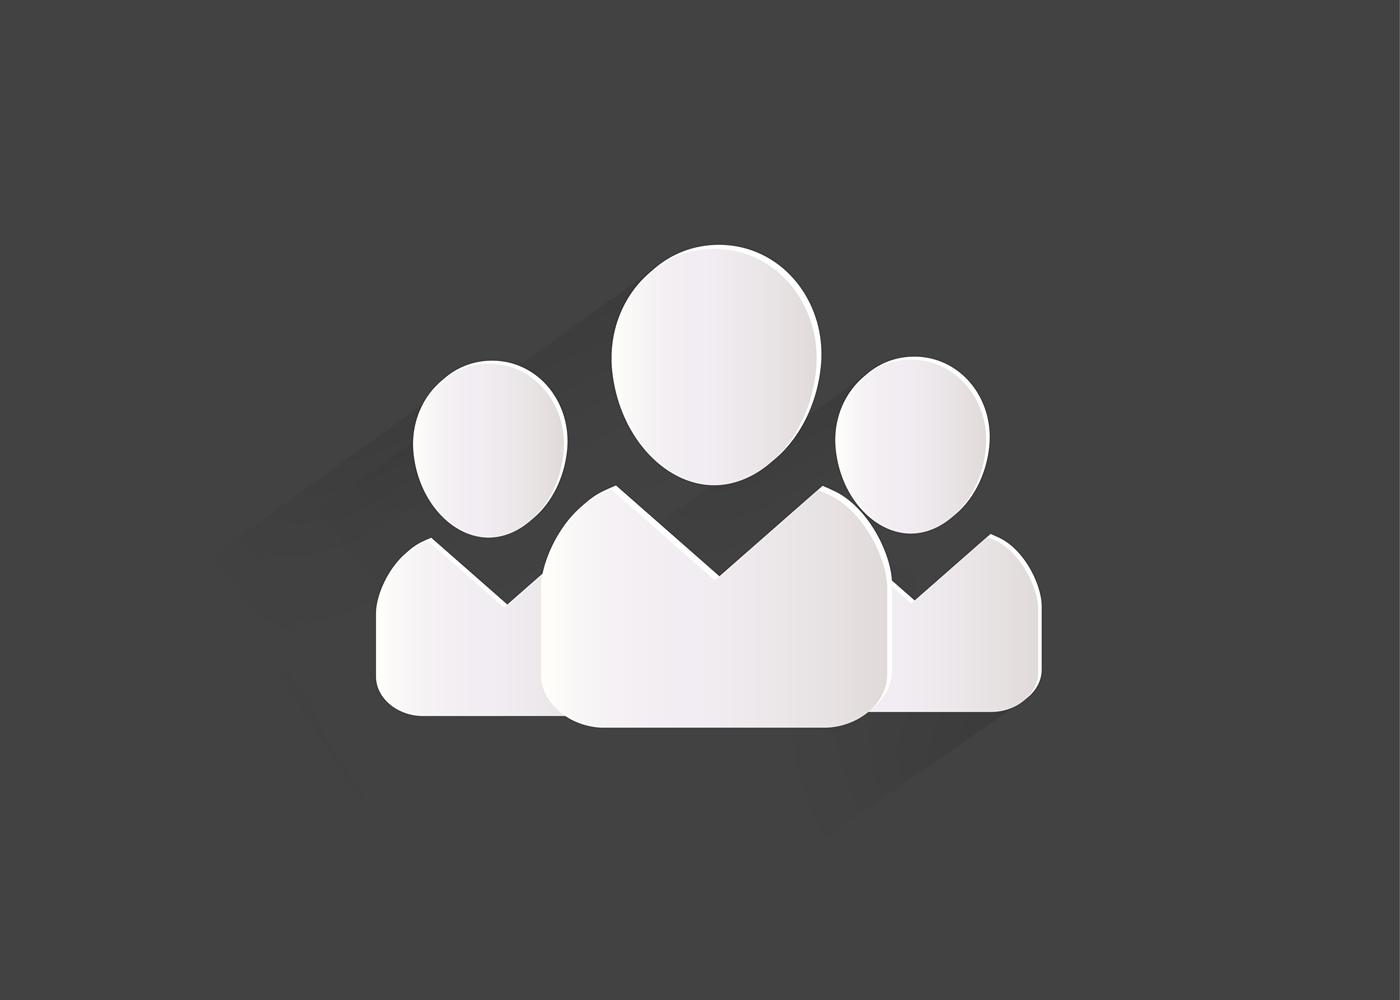 naem-research-quickpolls-2016-03-employee-engagement-700x500